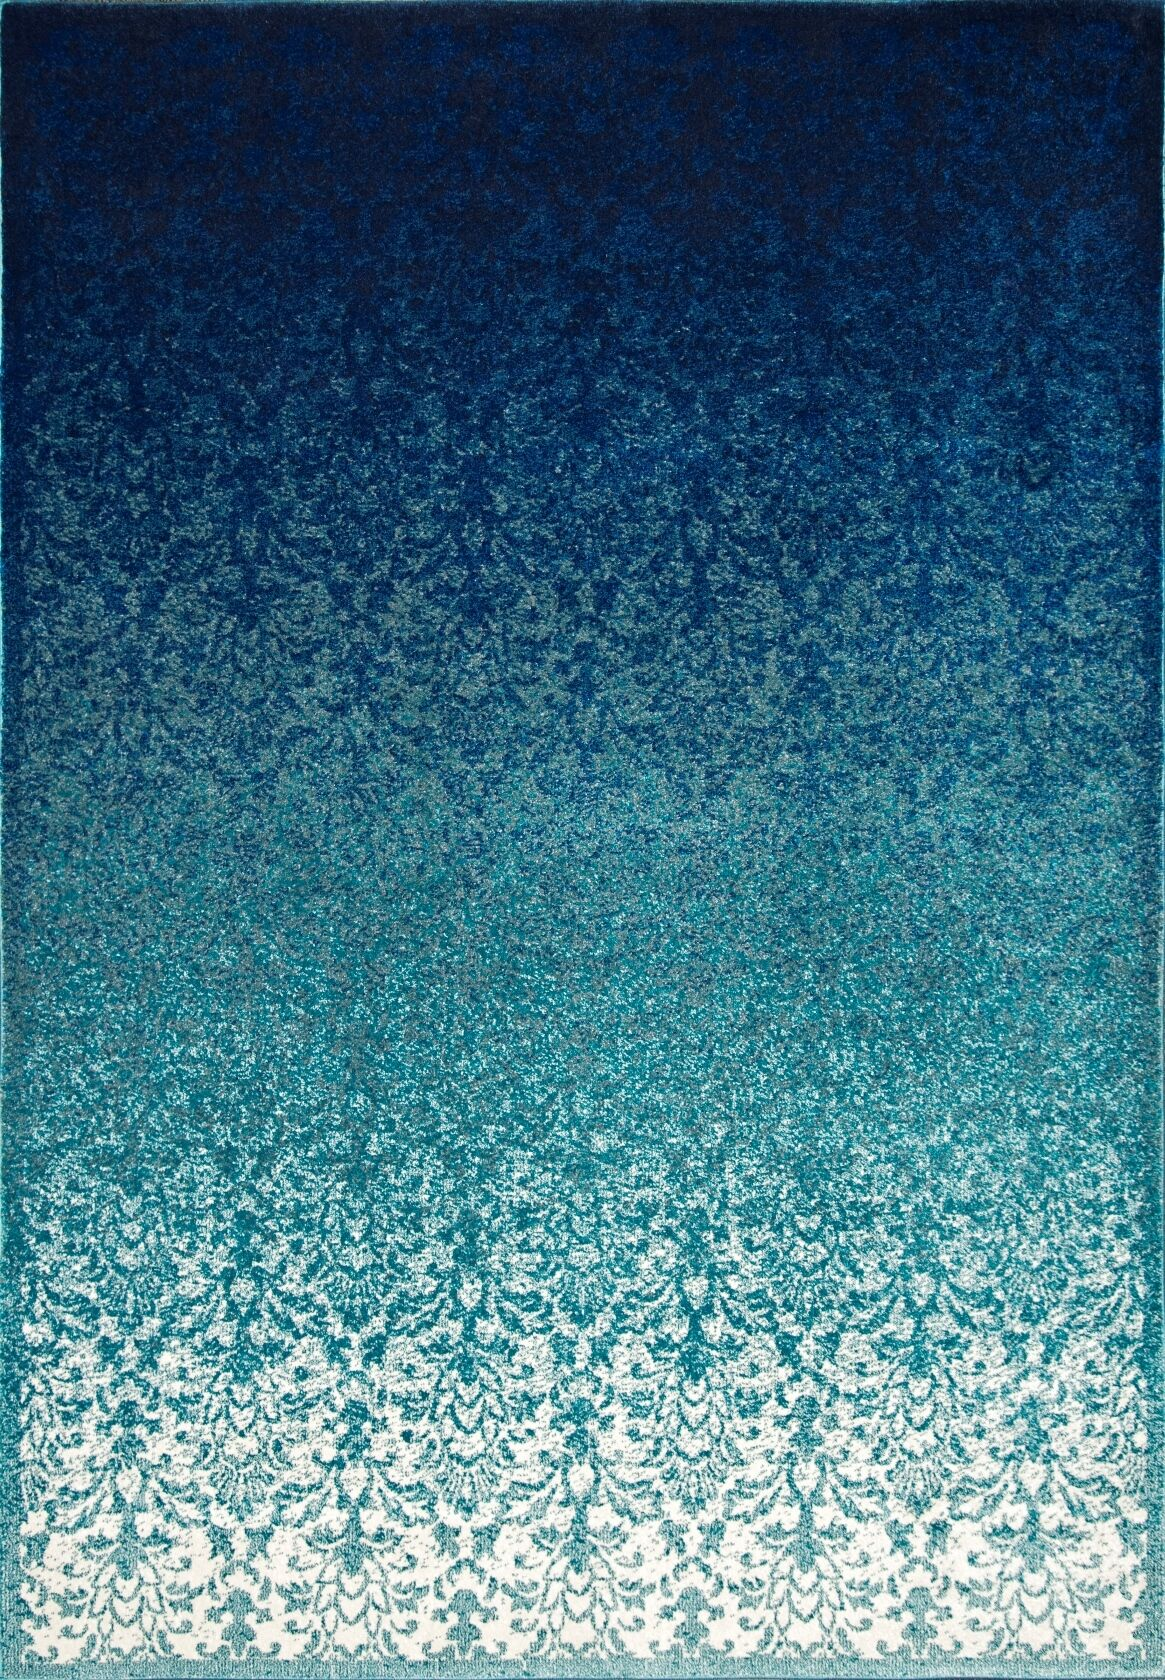 Clavene Turquoise Area Rug Rug Size: Rectangle 5'3